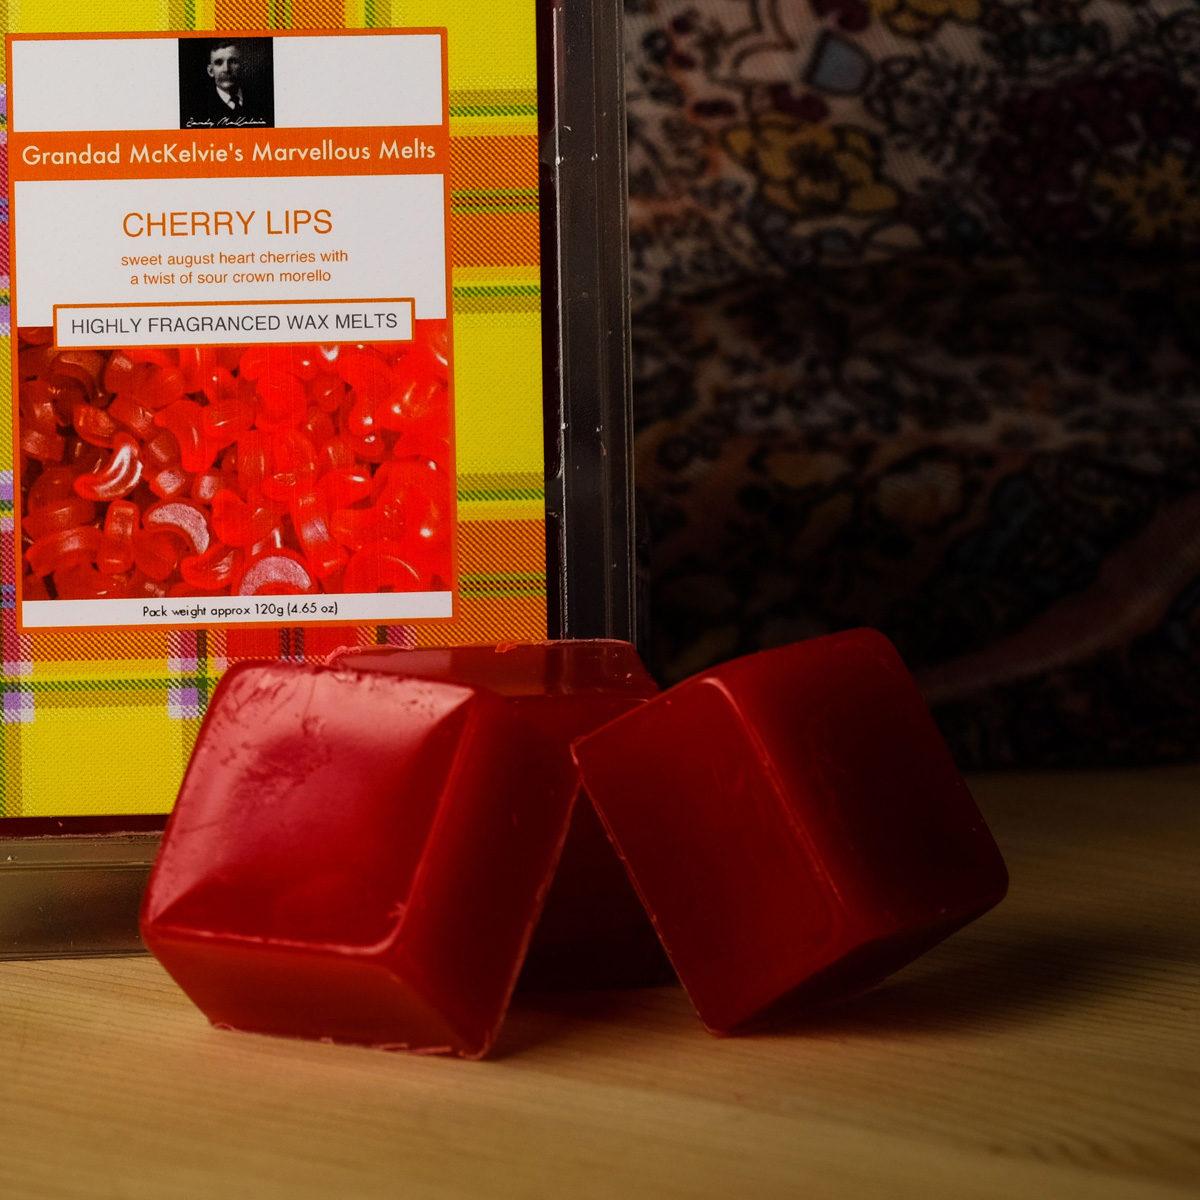 Cherry Lips Wax Melts